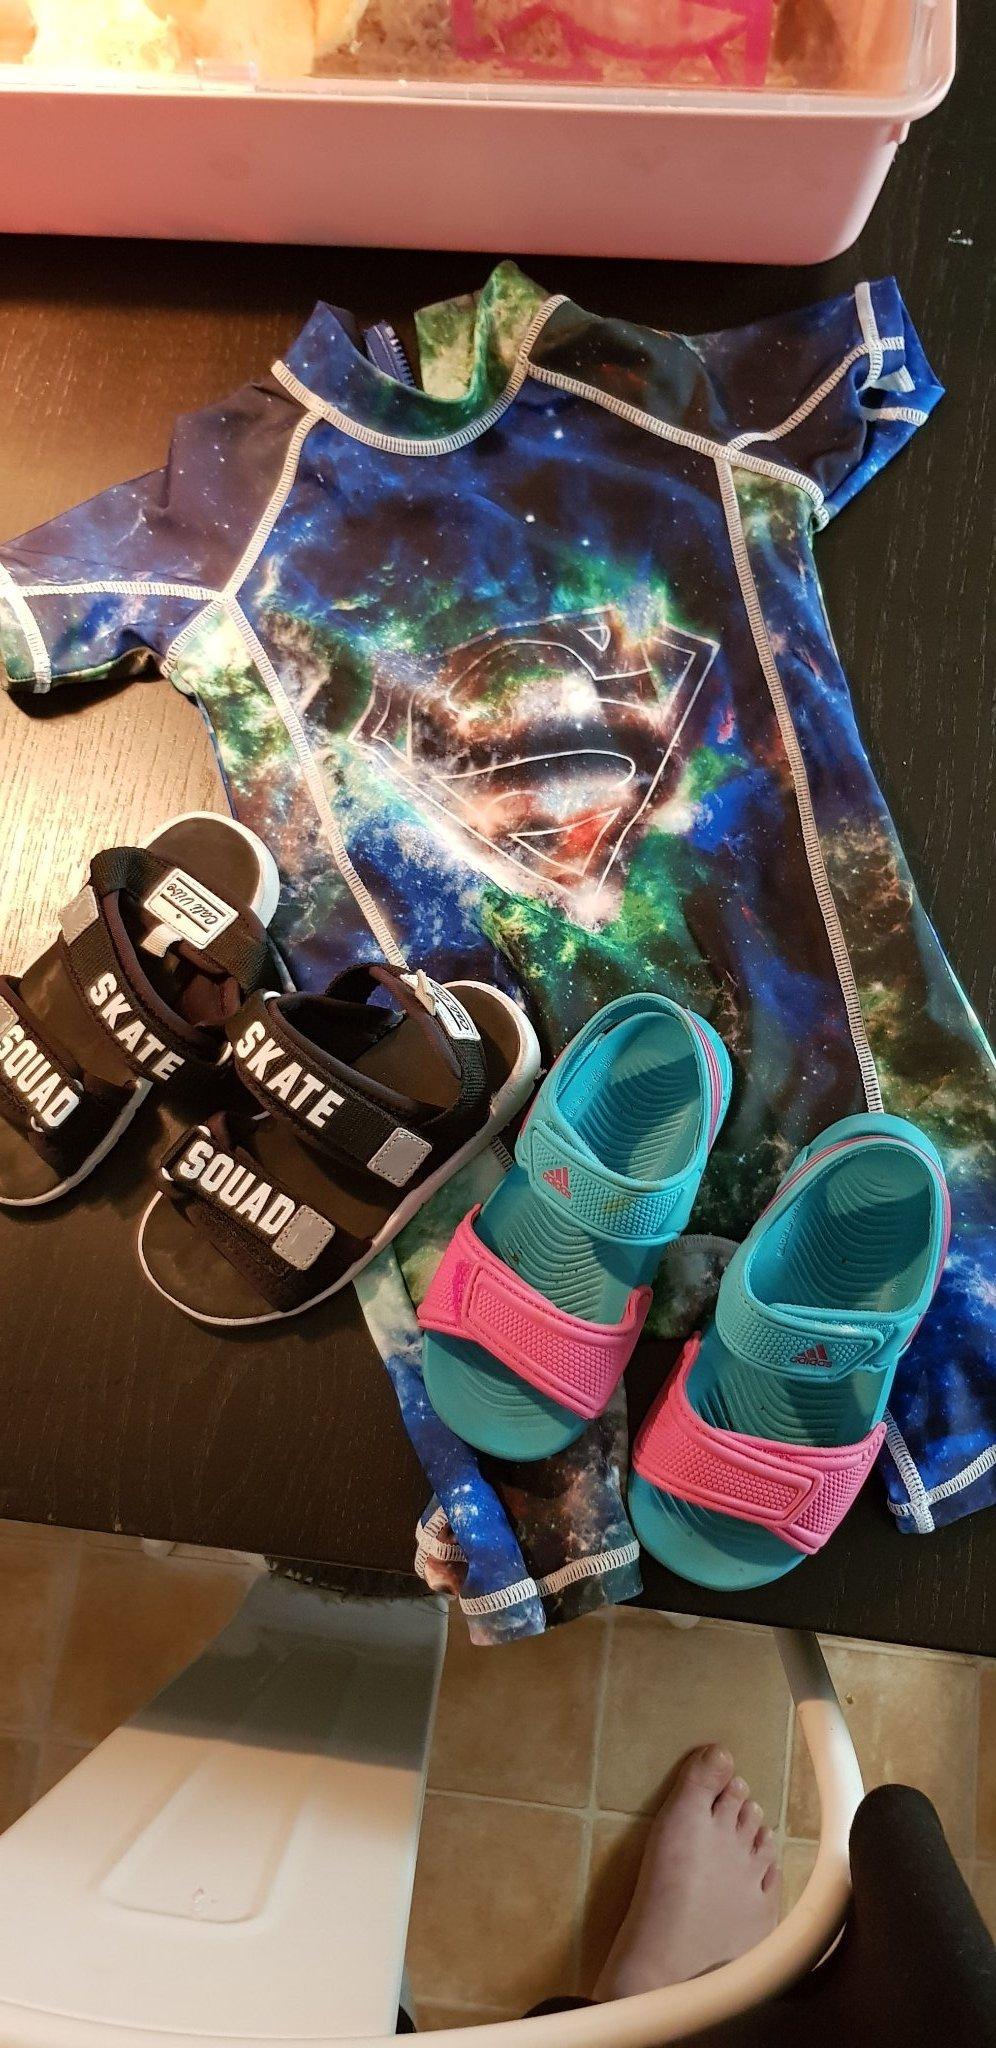 a3a6d1e8 Uv dräkt och sandaler (348287463) ᐈ Köp på Tradera